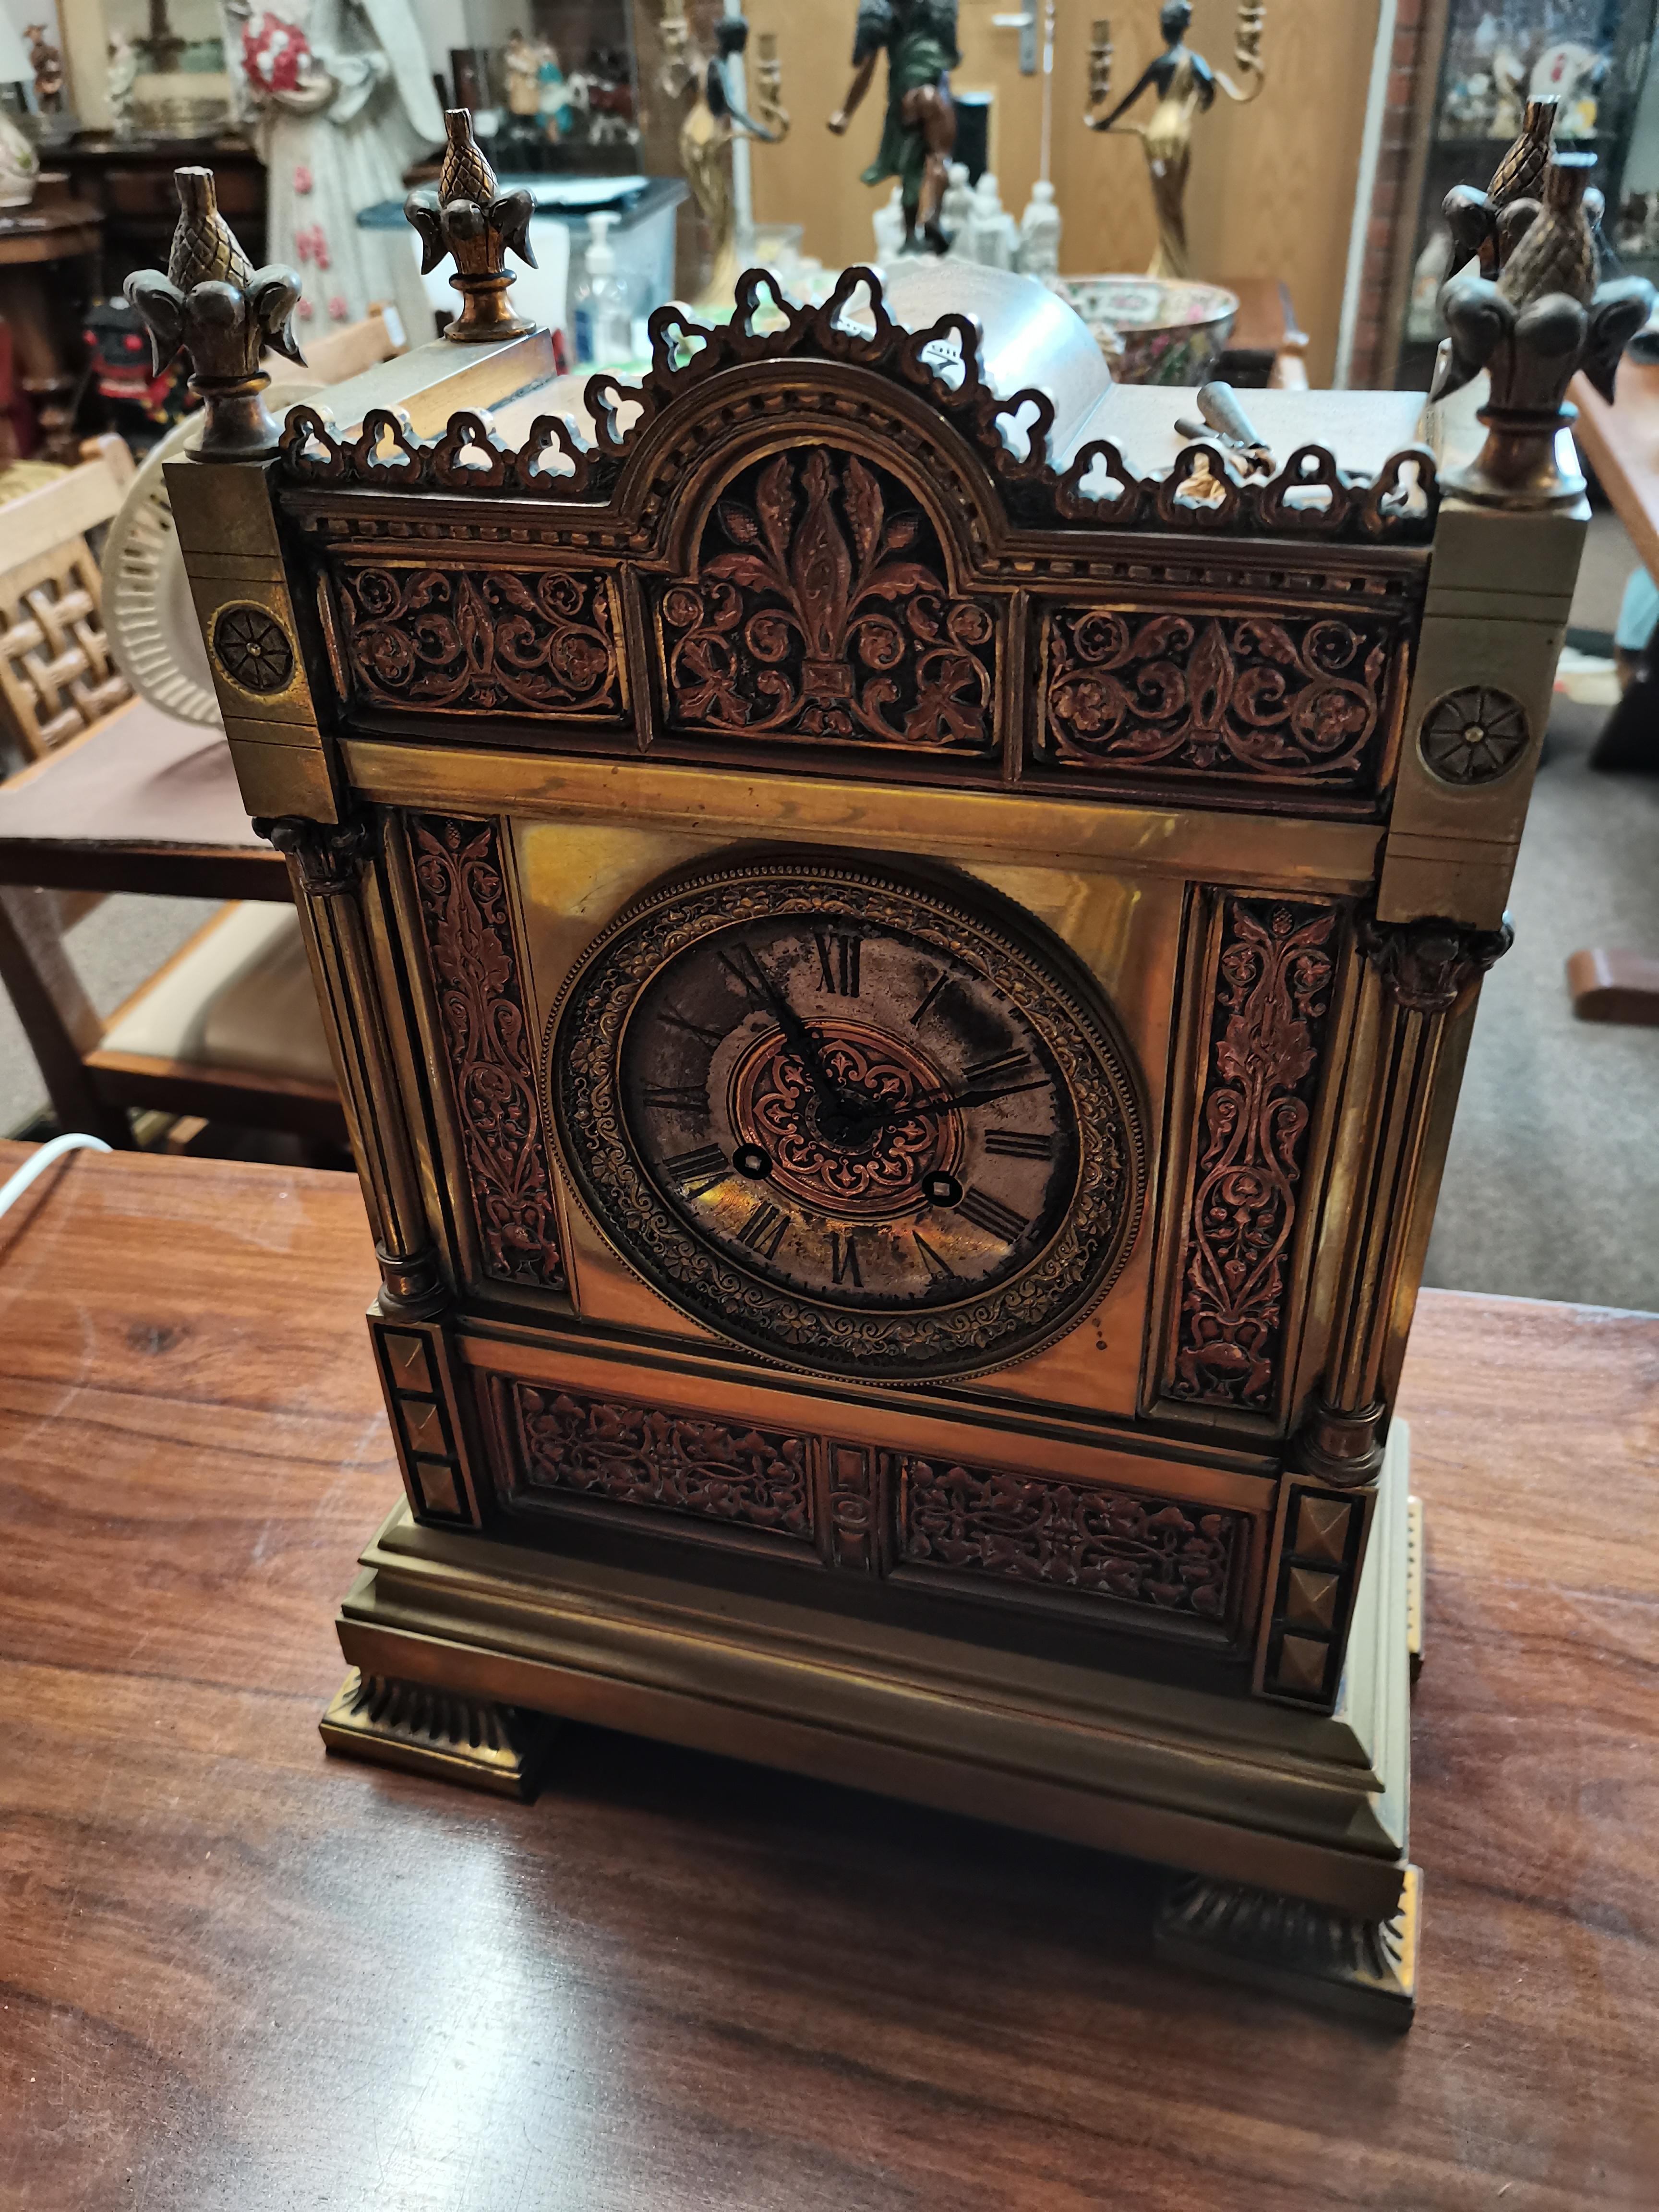 Antique 40cm brass mantle clock - Image 5 of 5